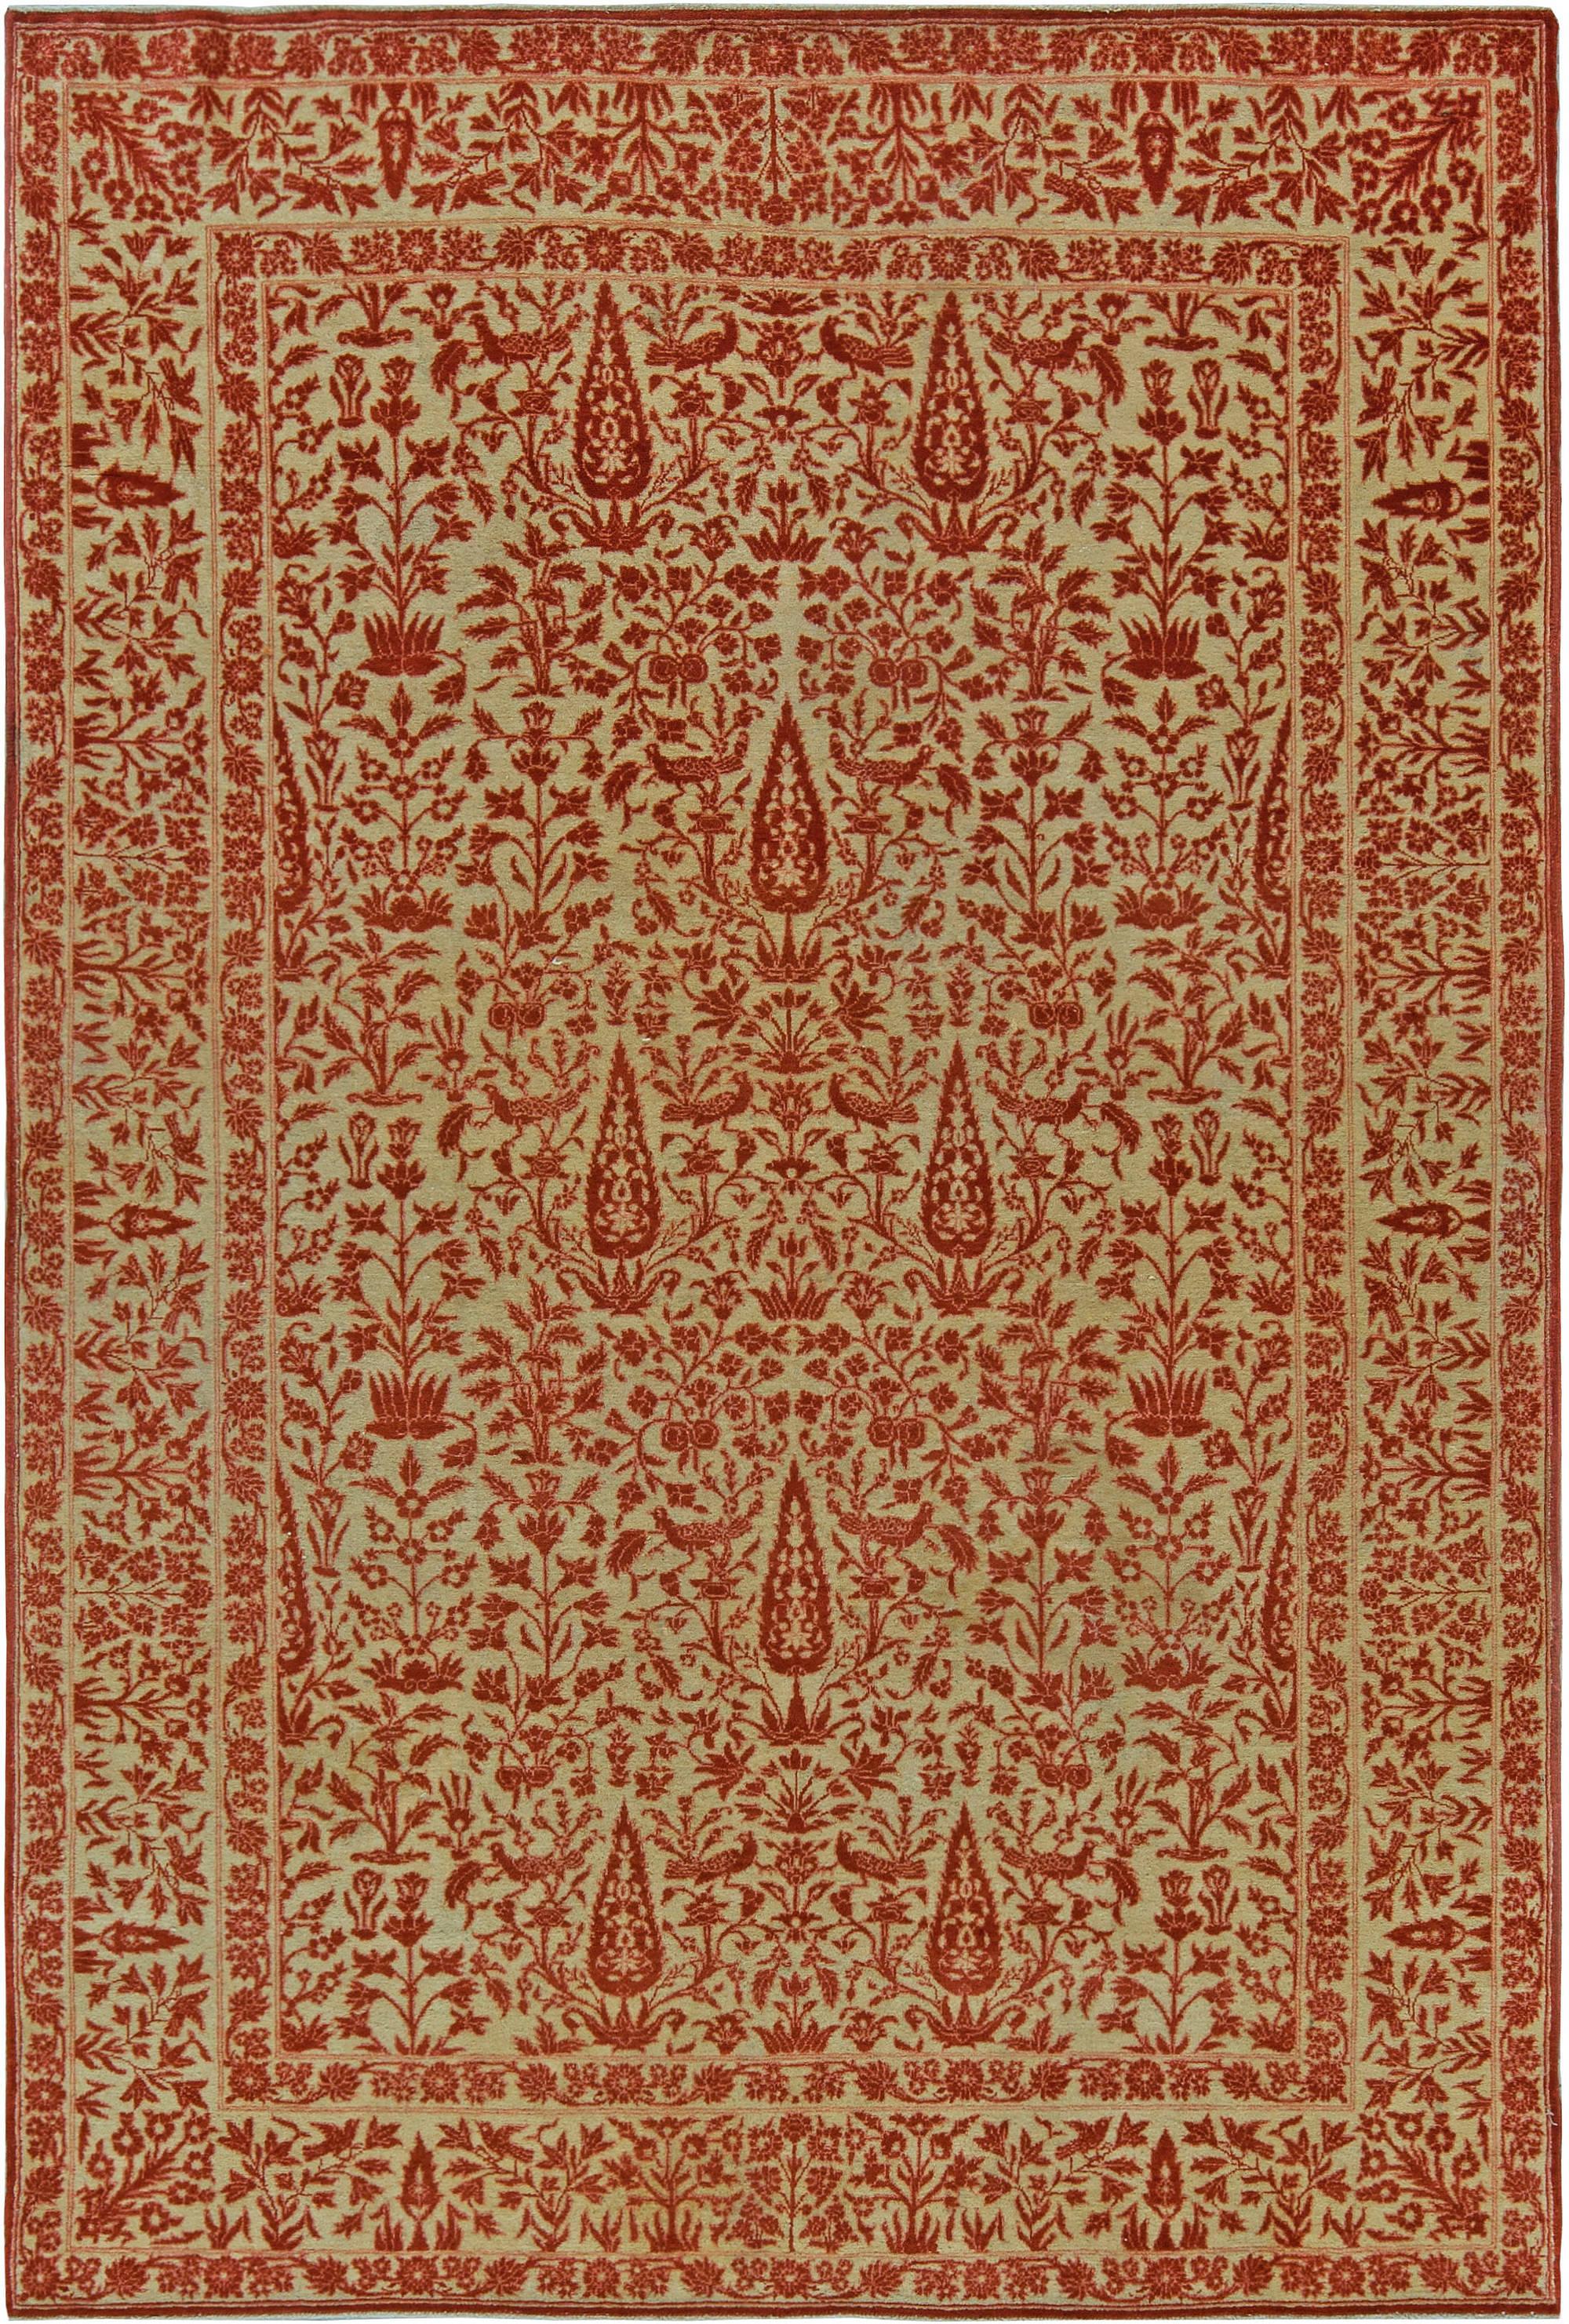 c9c33df9a2680 Antique Tabriz Rugs - Home and small bathroom ideas